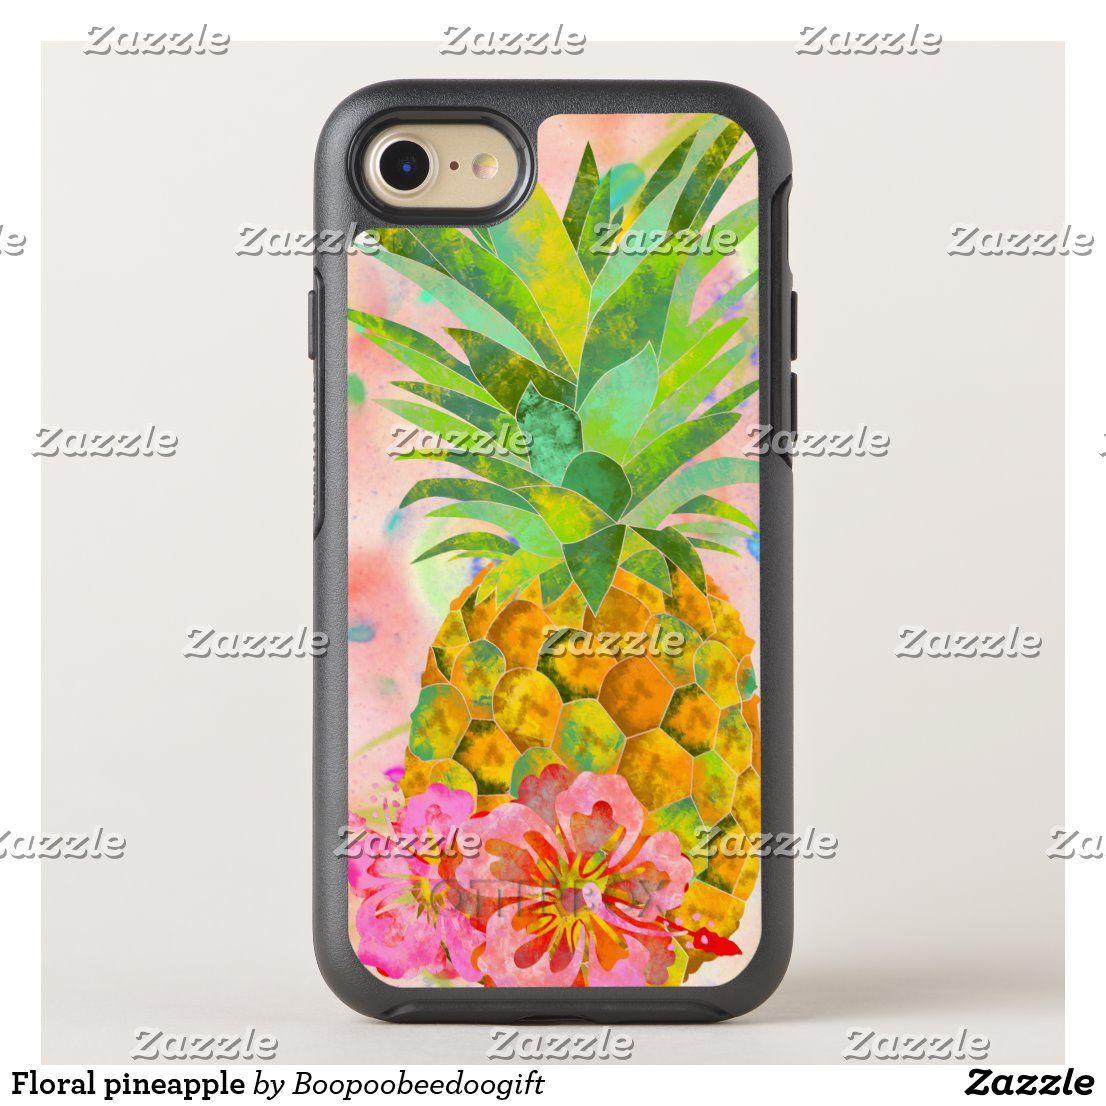 Blumen Ananas OtterBox iPhone Hülle | Zazzle.com   – Phone Cases